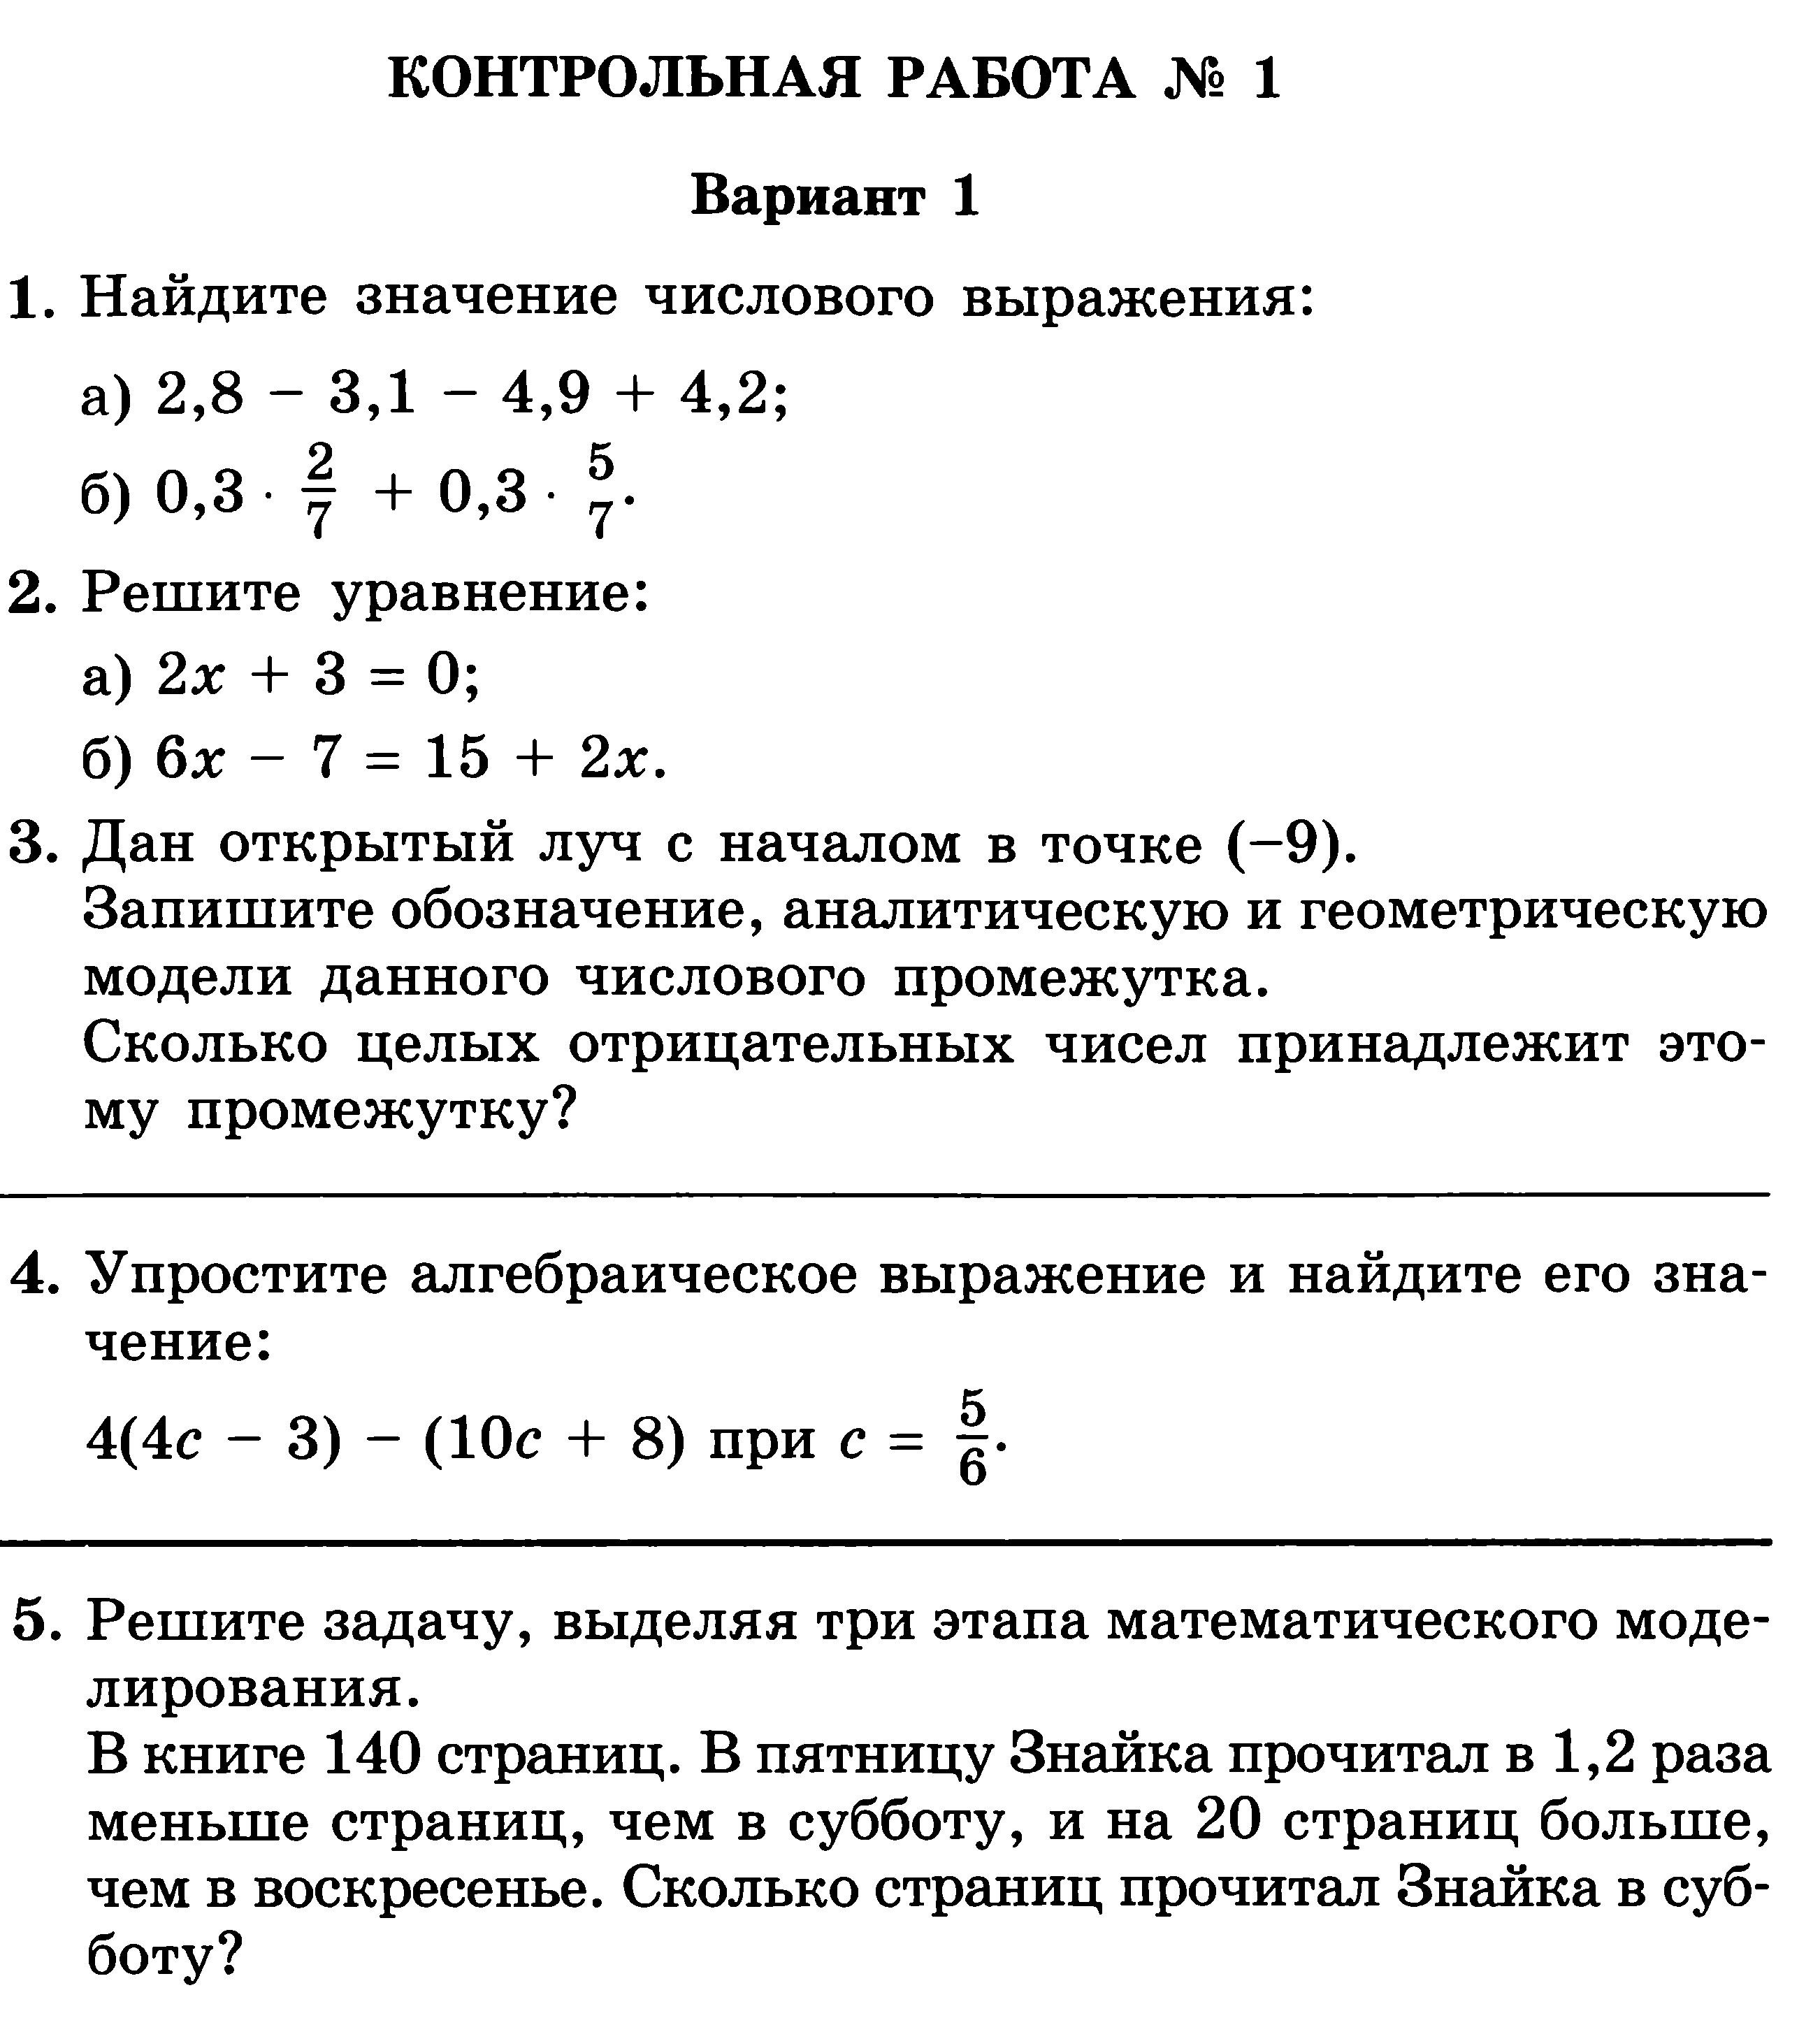 Решебник задач по математике 2 класс демидова